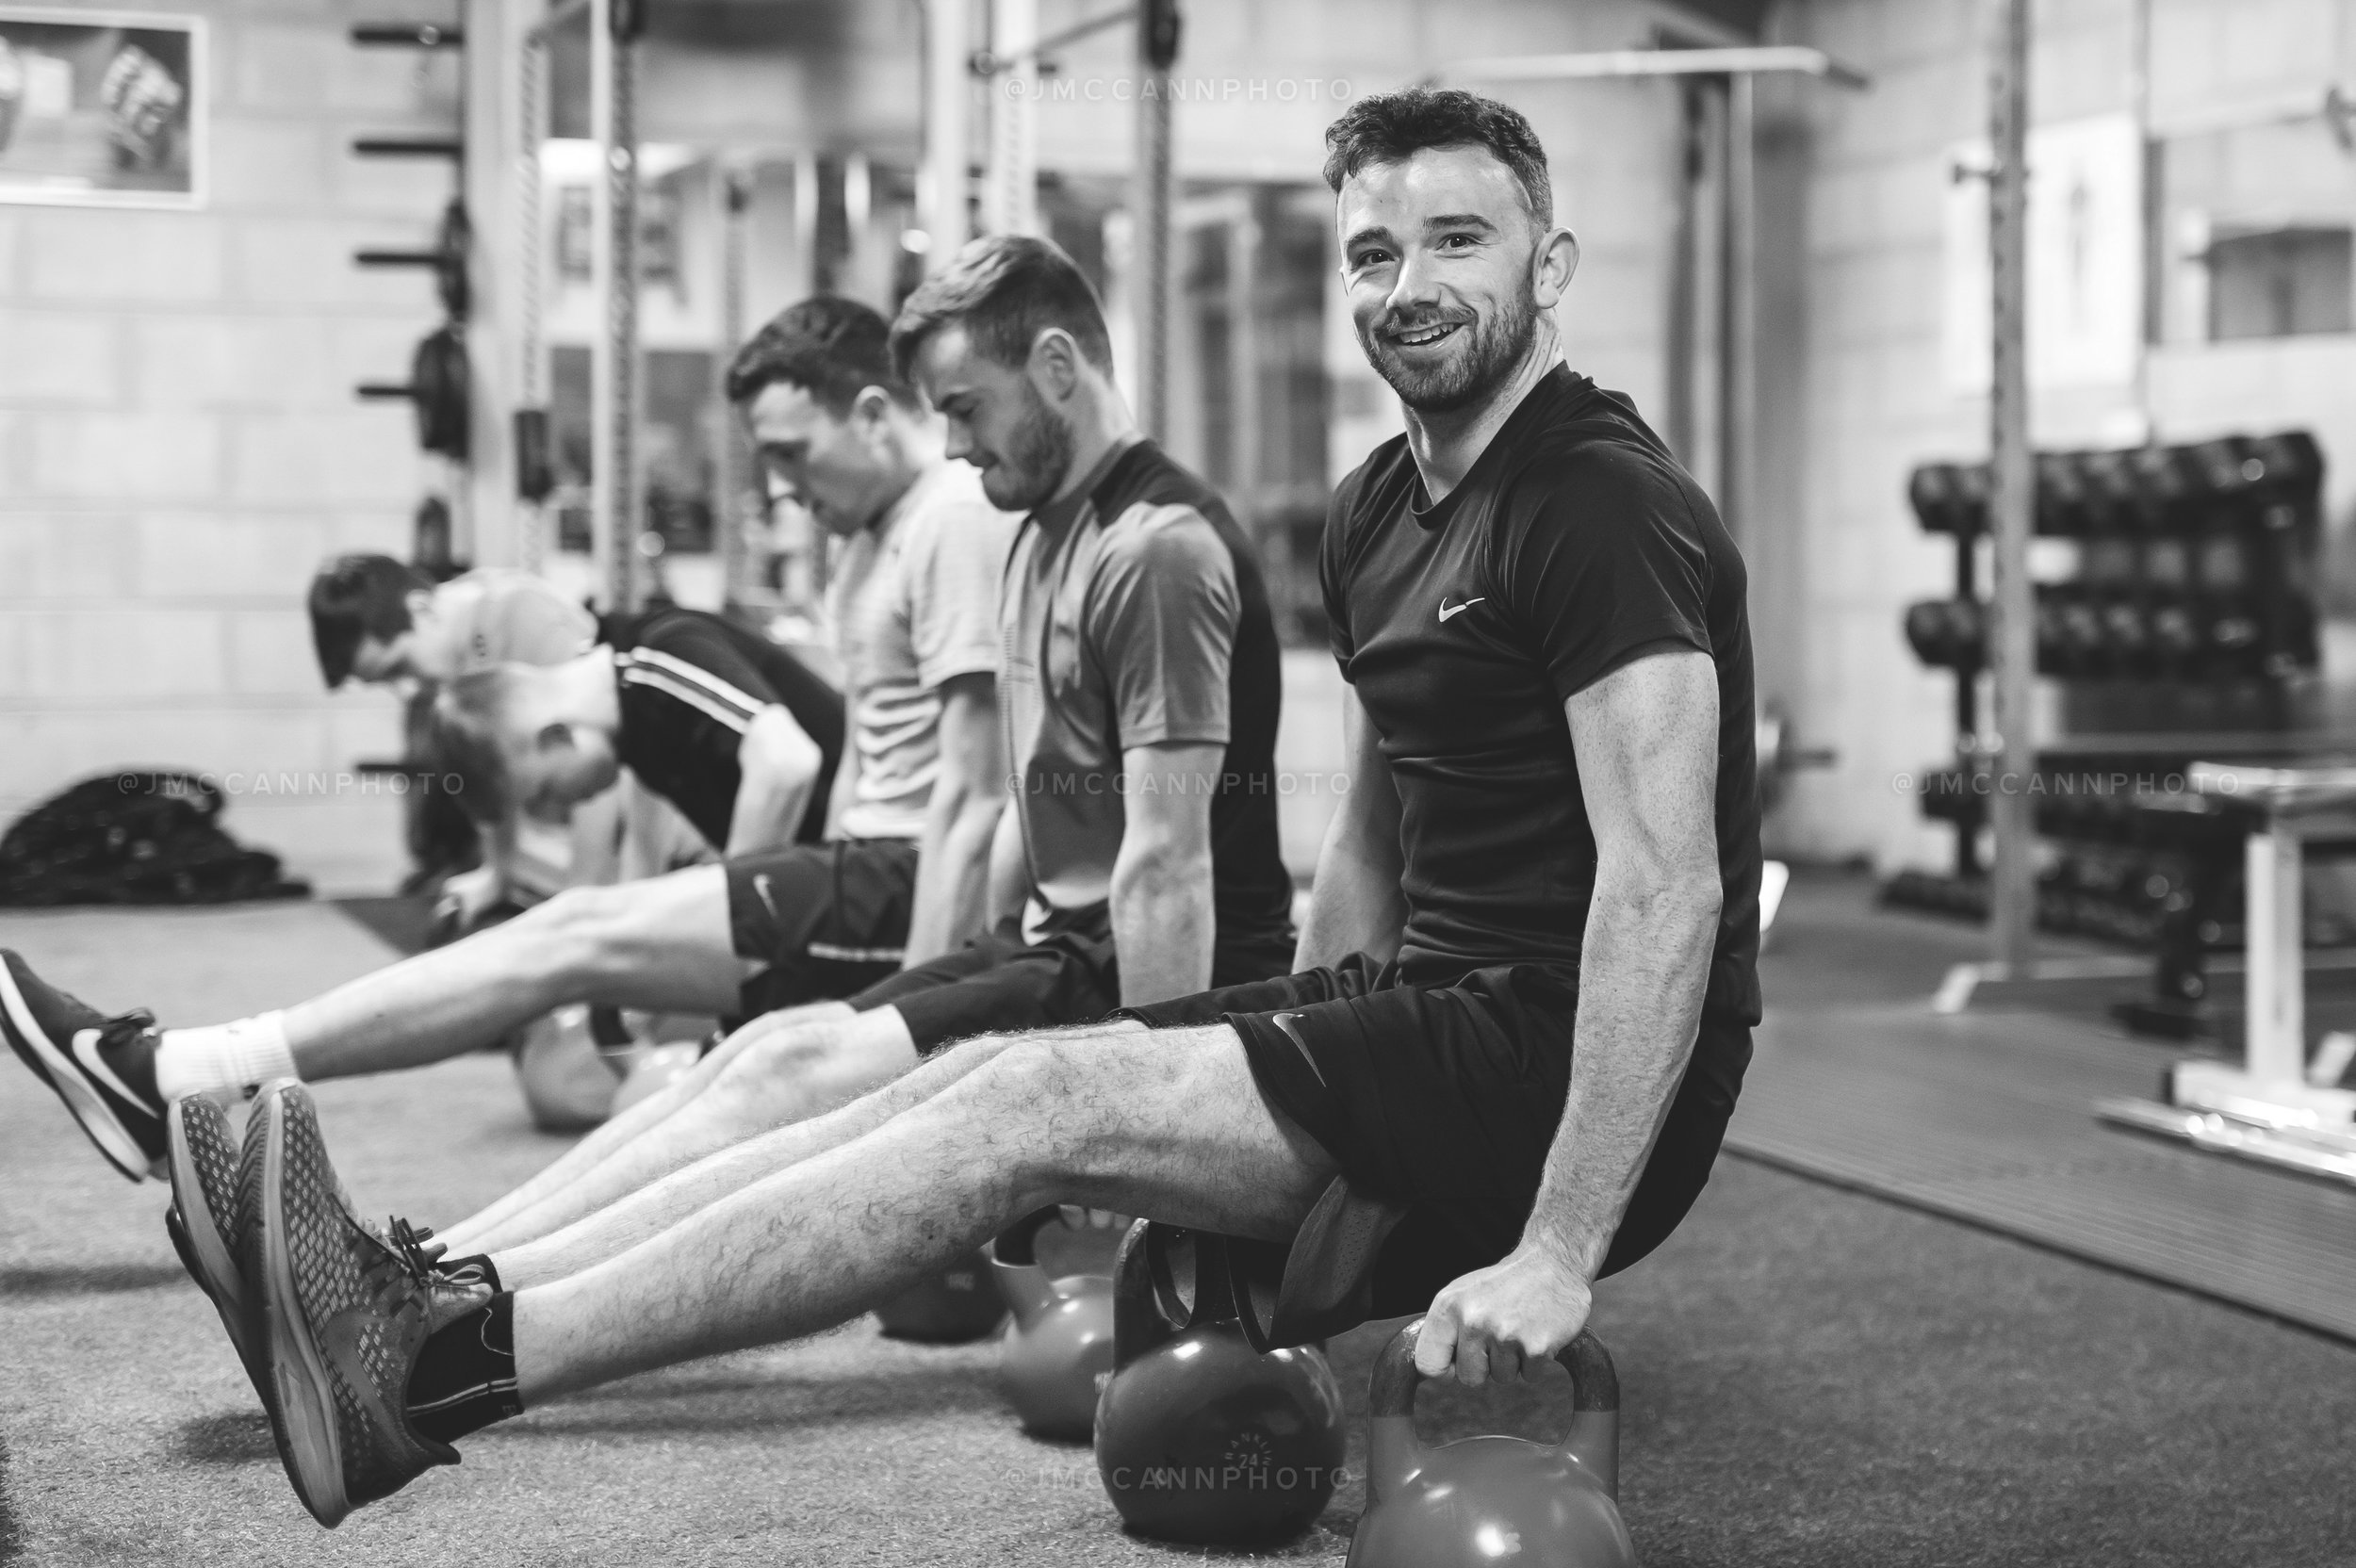 Glenn obviously enjoying his training.